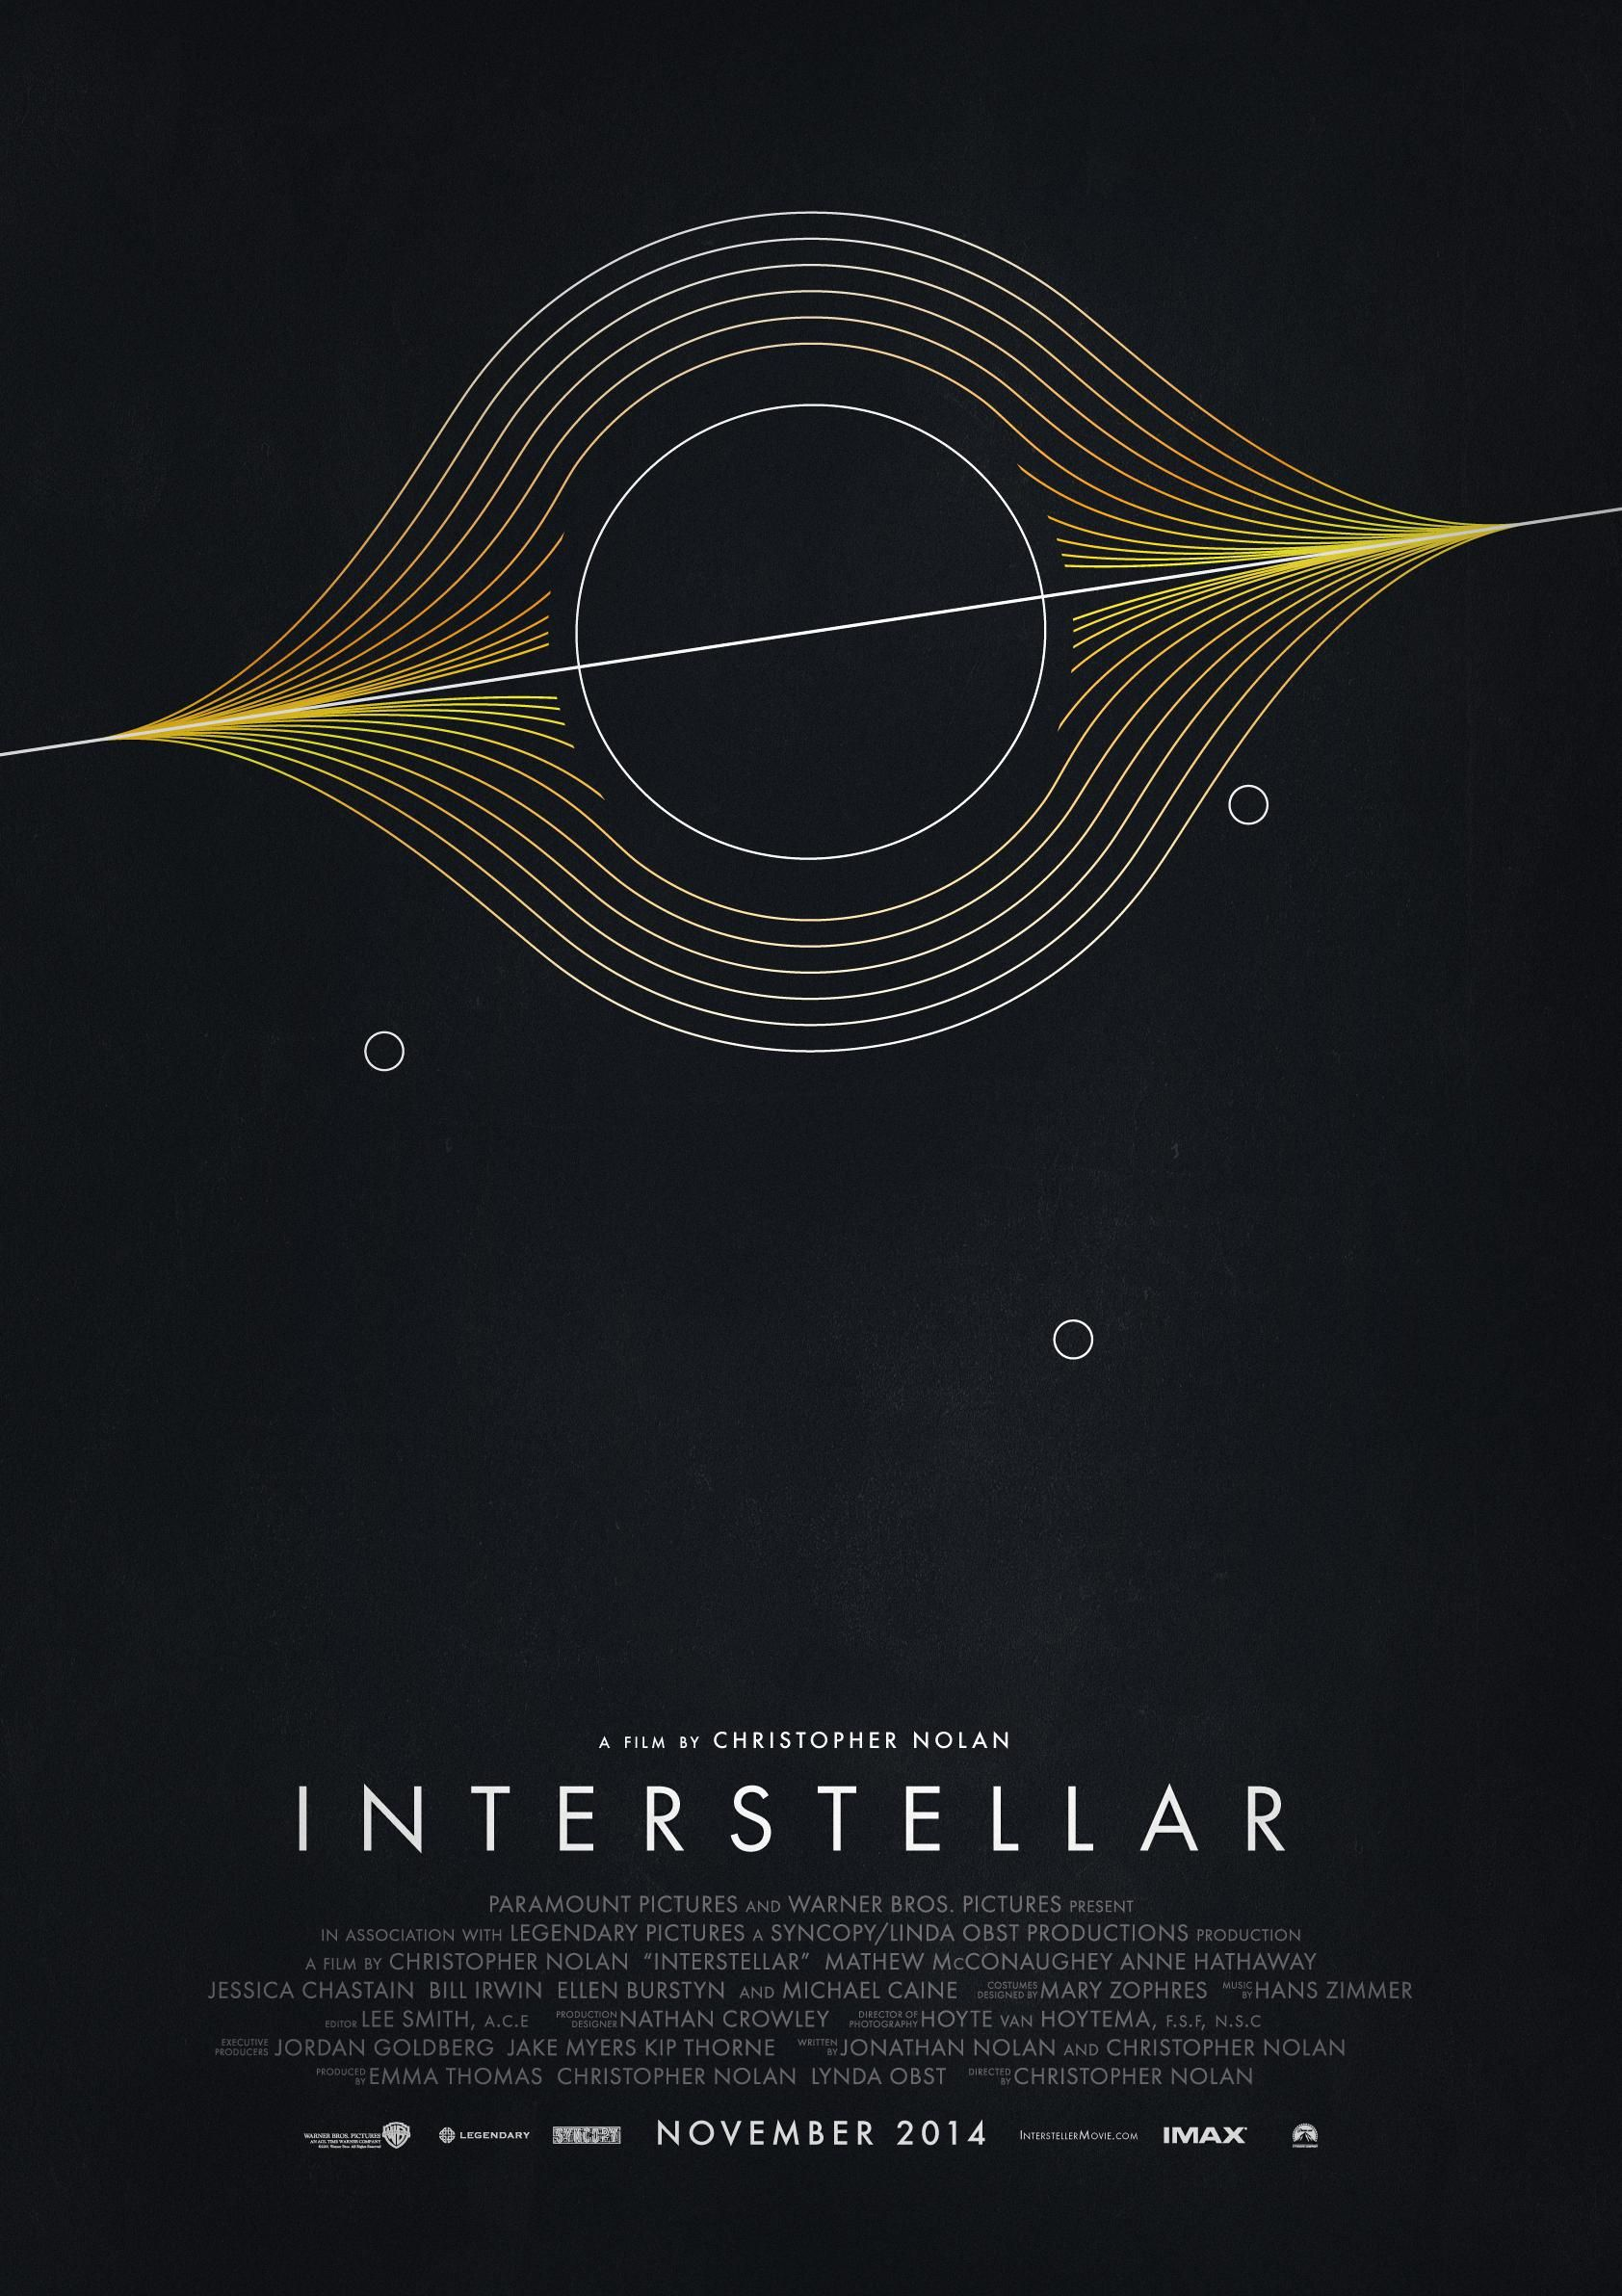 Interstellar Movie Poster …   Illustration in 2019…  Interstellar Mo...